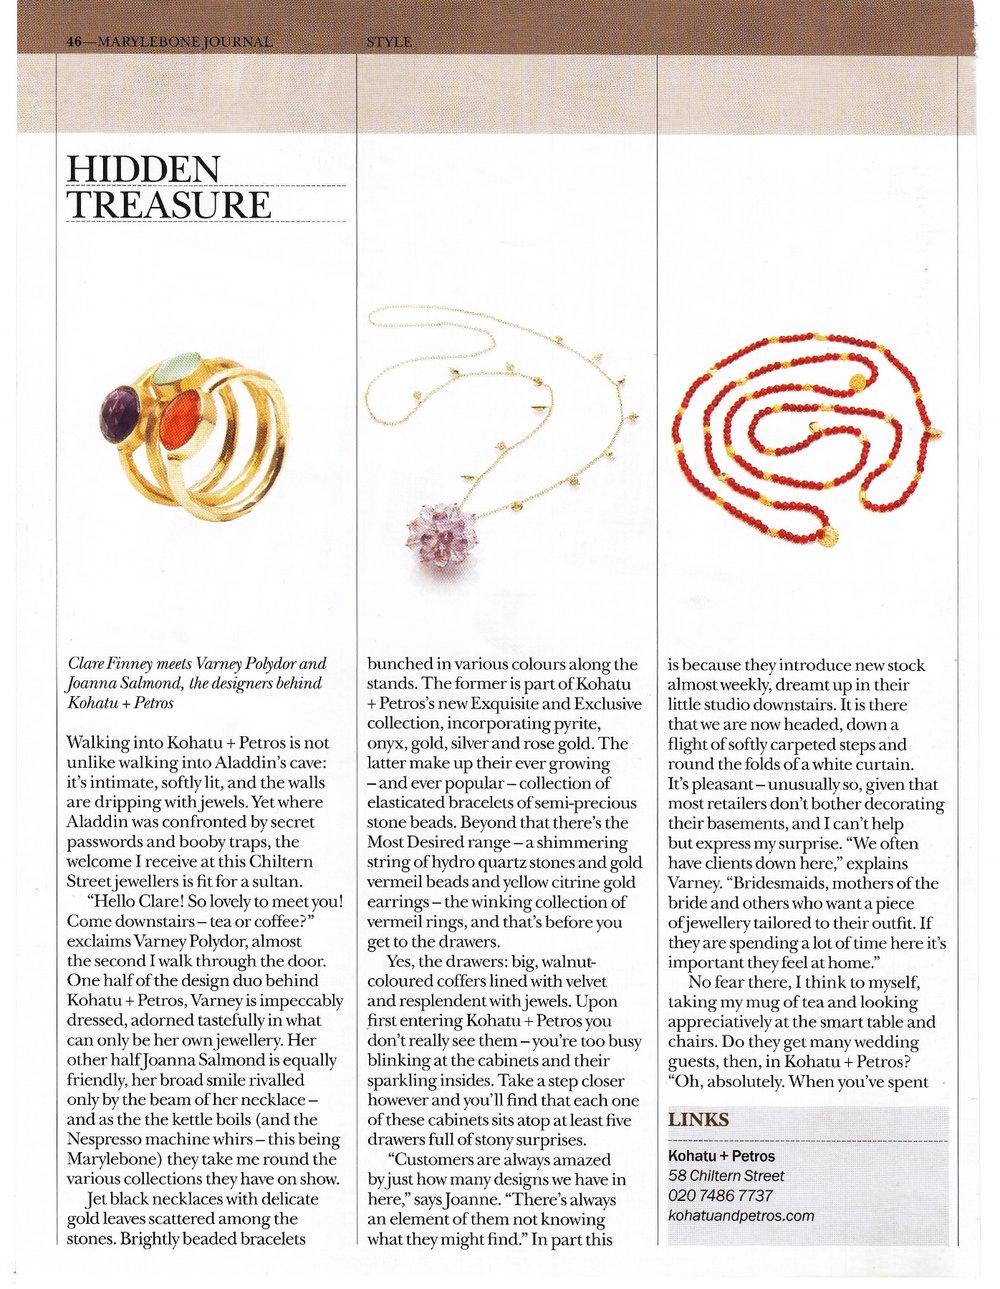 Marylebone Journal Feature